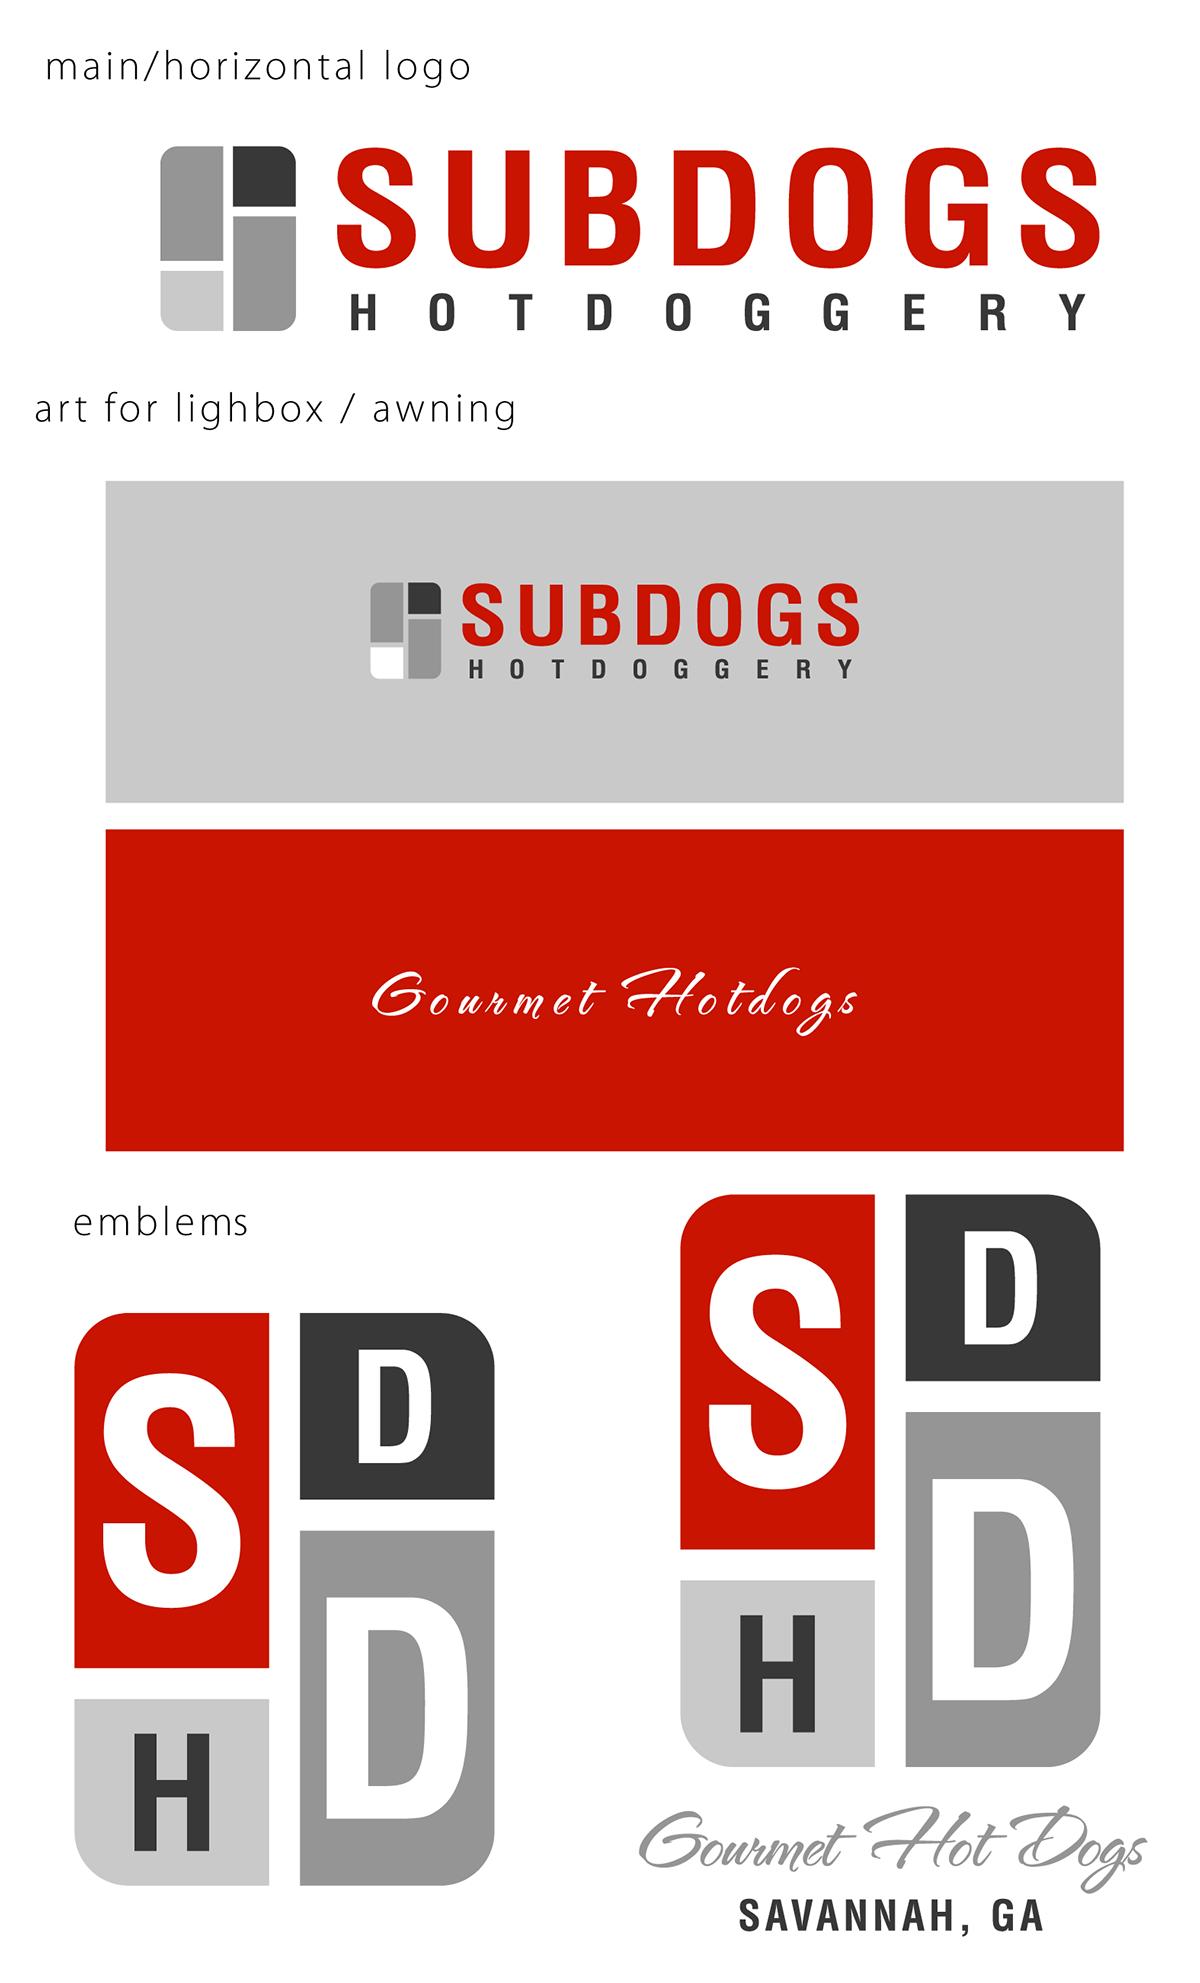 Subdogs Hotdoggery branding and logo | Savannah, GA